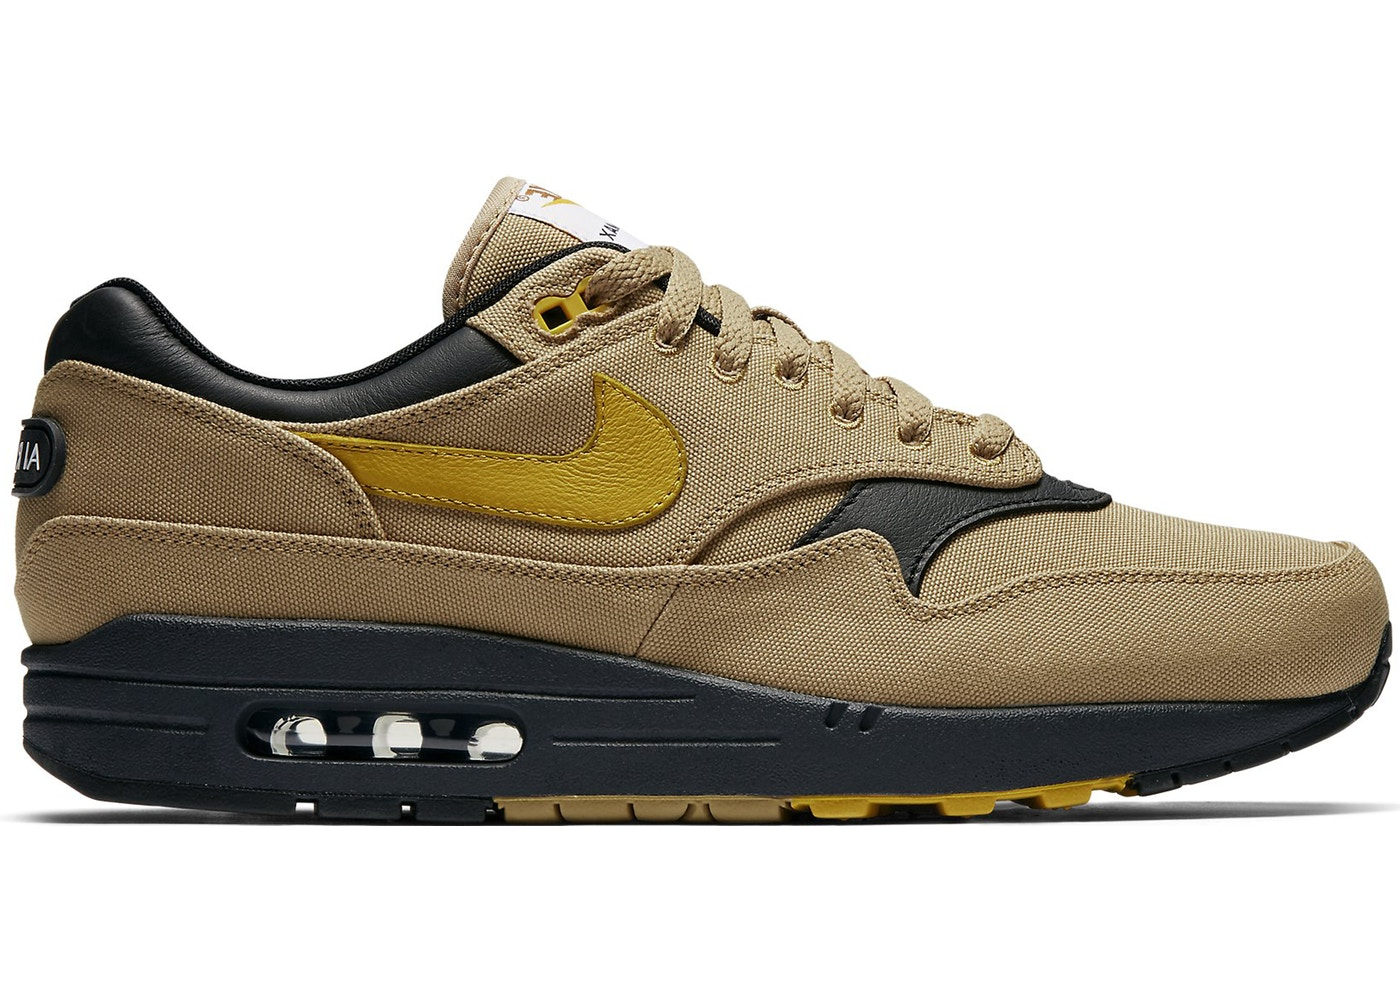 4a99c67961 Nike Air Max 1 Shoes - New Highest Bids